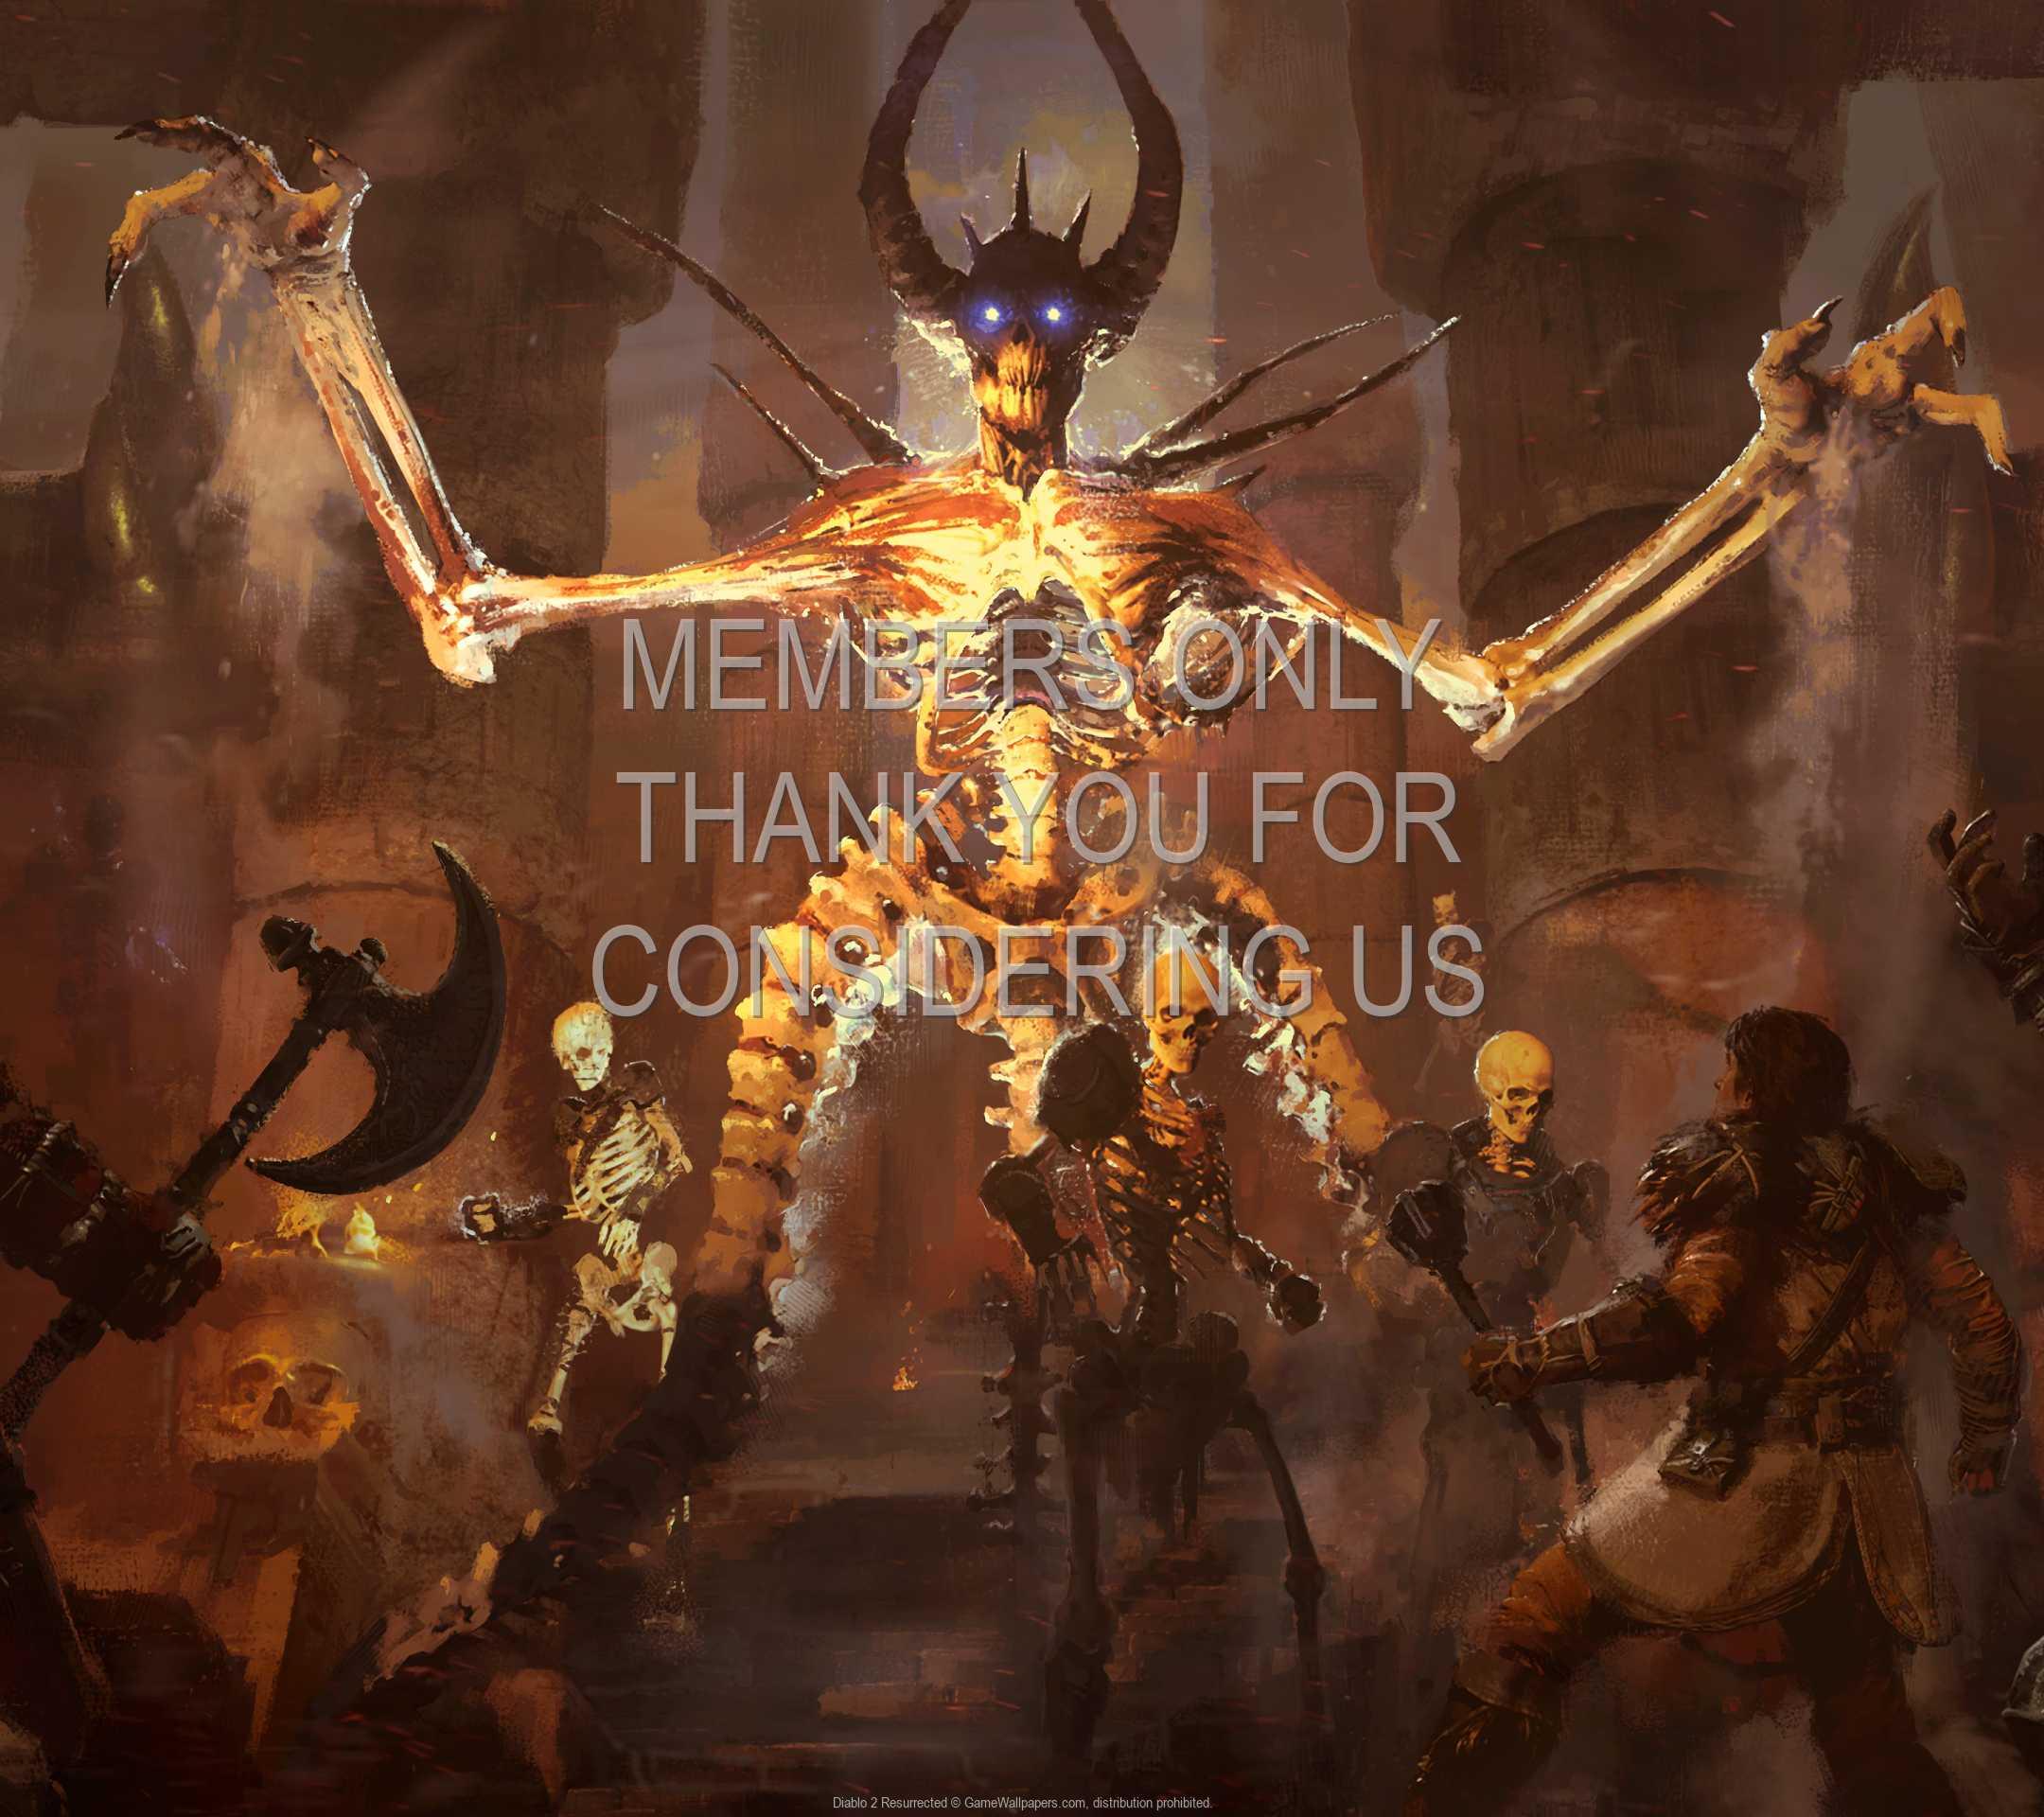 Diablo 2: Resurrected 1080p Horizontal Mobile wallpaper or background 04